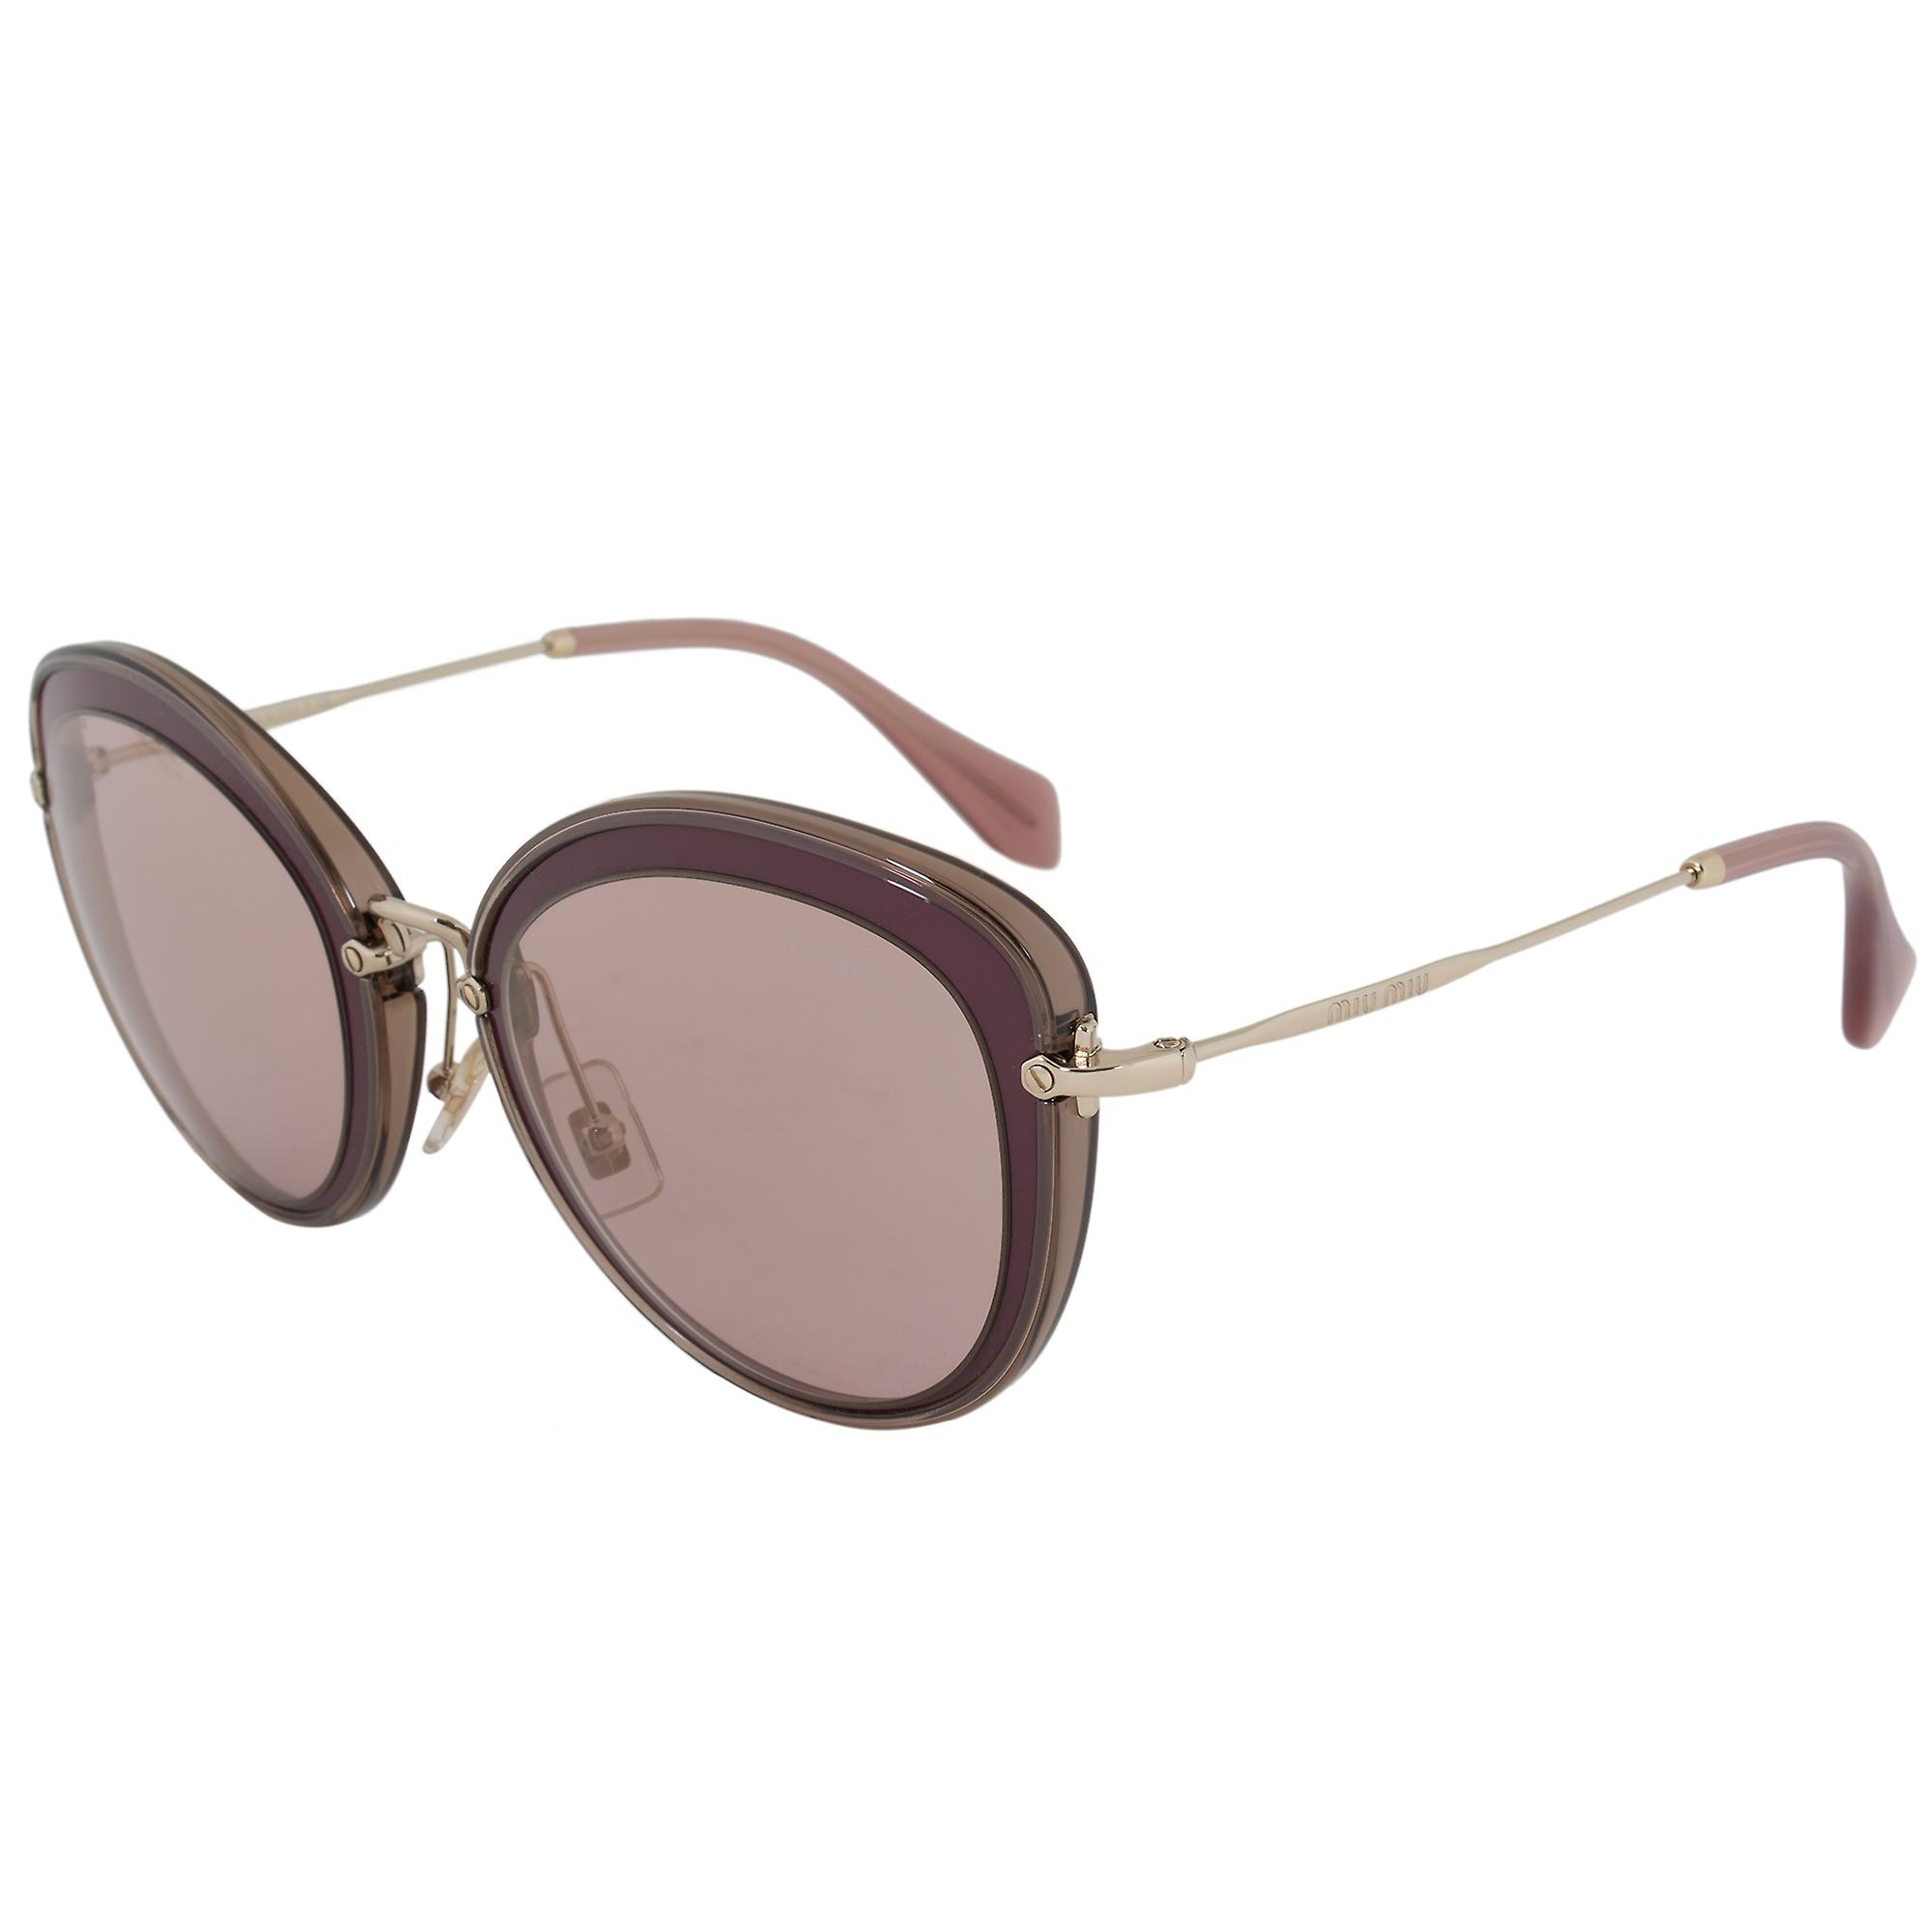 Miu Miu Round Sunglasses SMU50RS TKW4M2 54 | Purple Frame | Gold Mirror Lenses